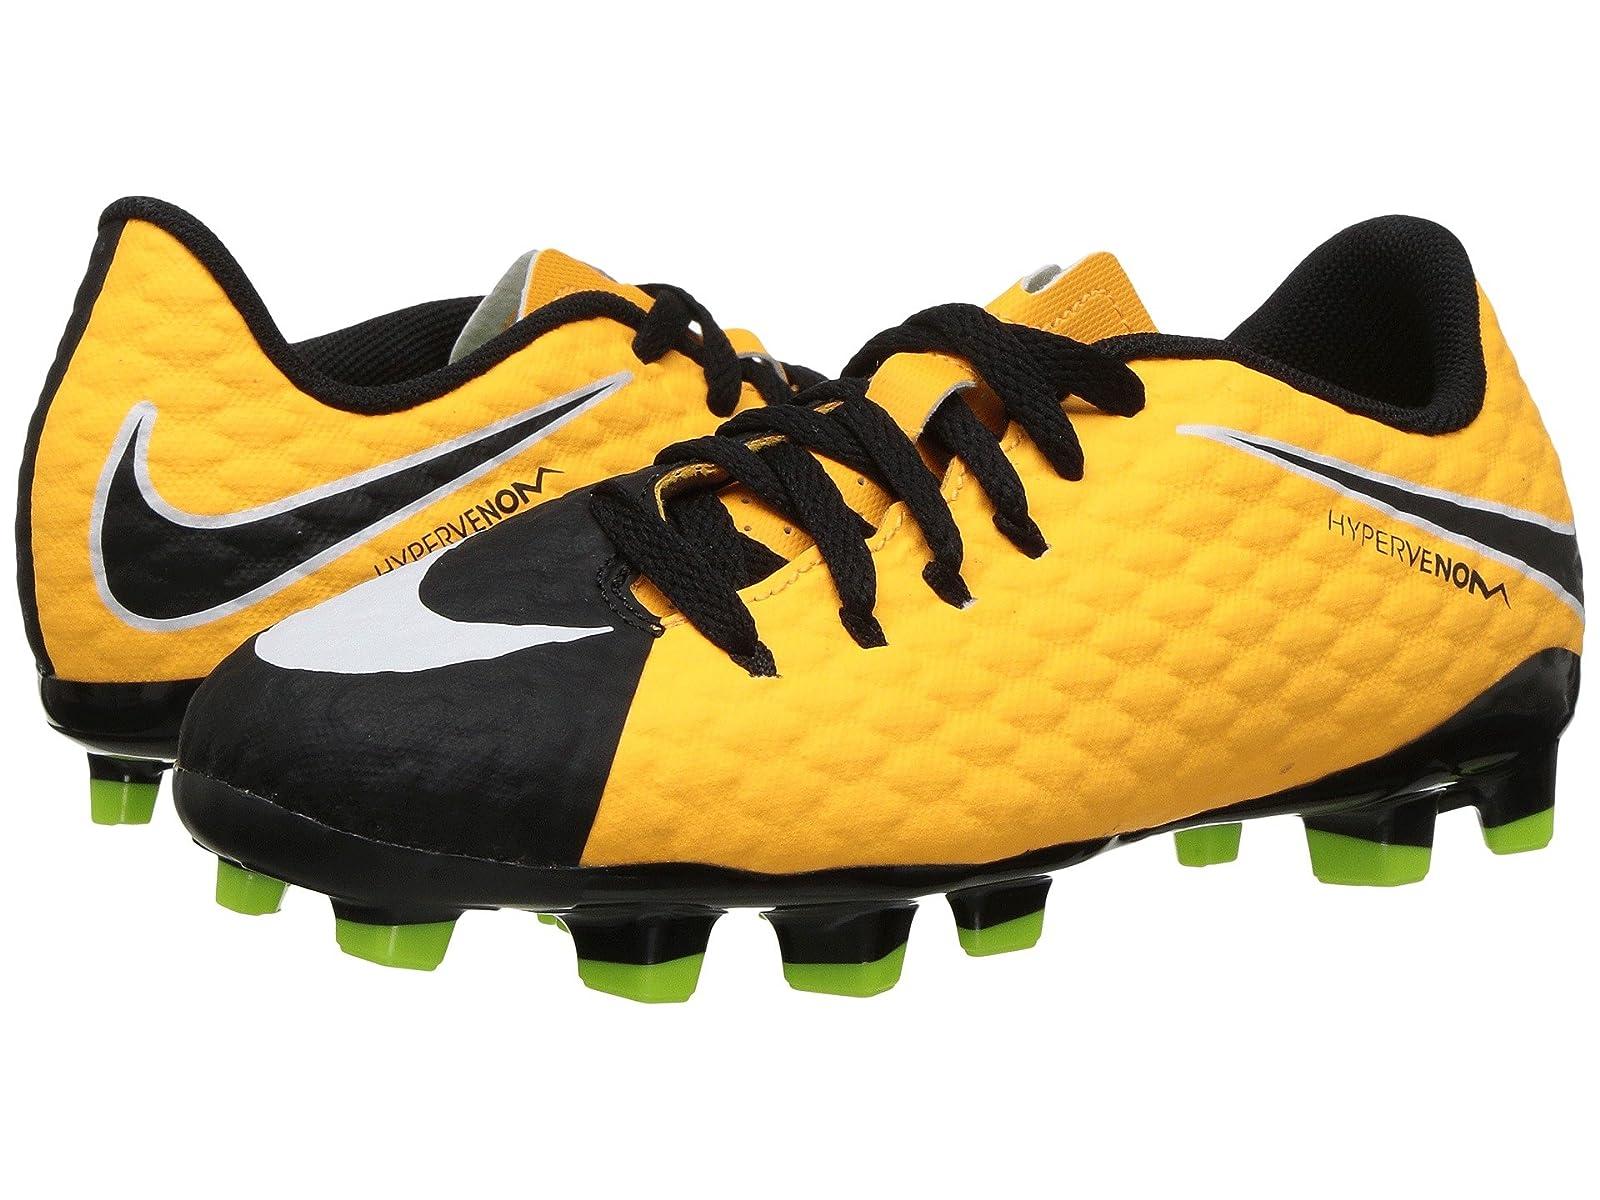 Mr/Ms < Nike Kids Jr Hypervenom Phelon III Soccer (Toddler/Little Superior Kid/Big Kid)  < Superior (Toddler/Little in quality 6adf7a